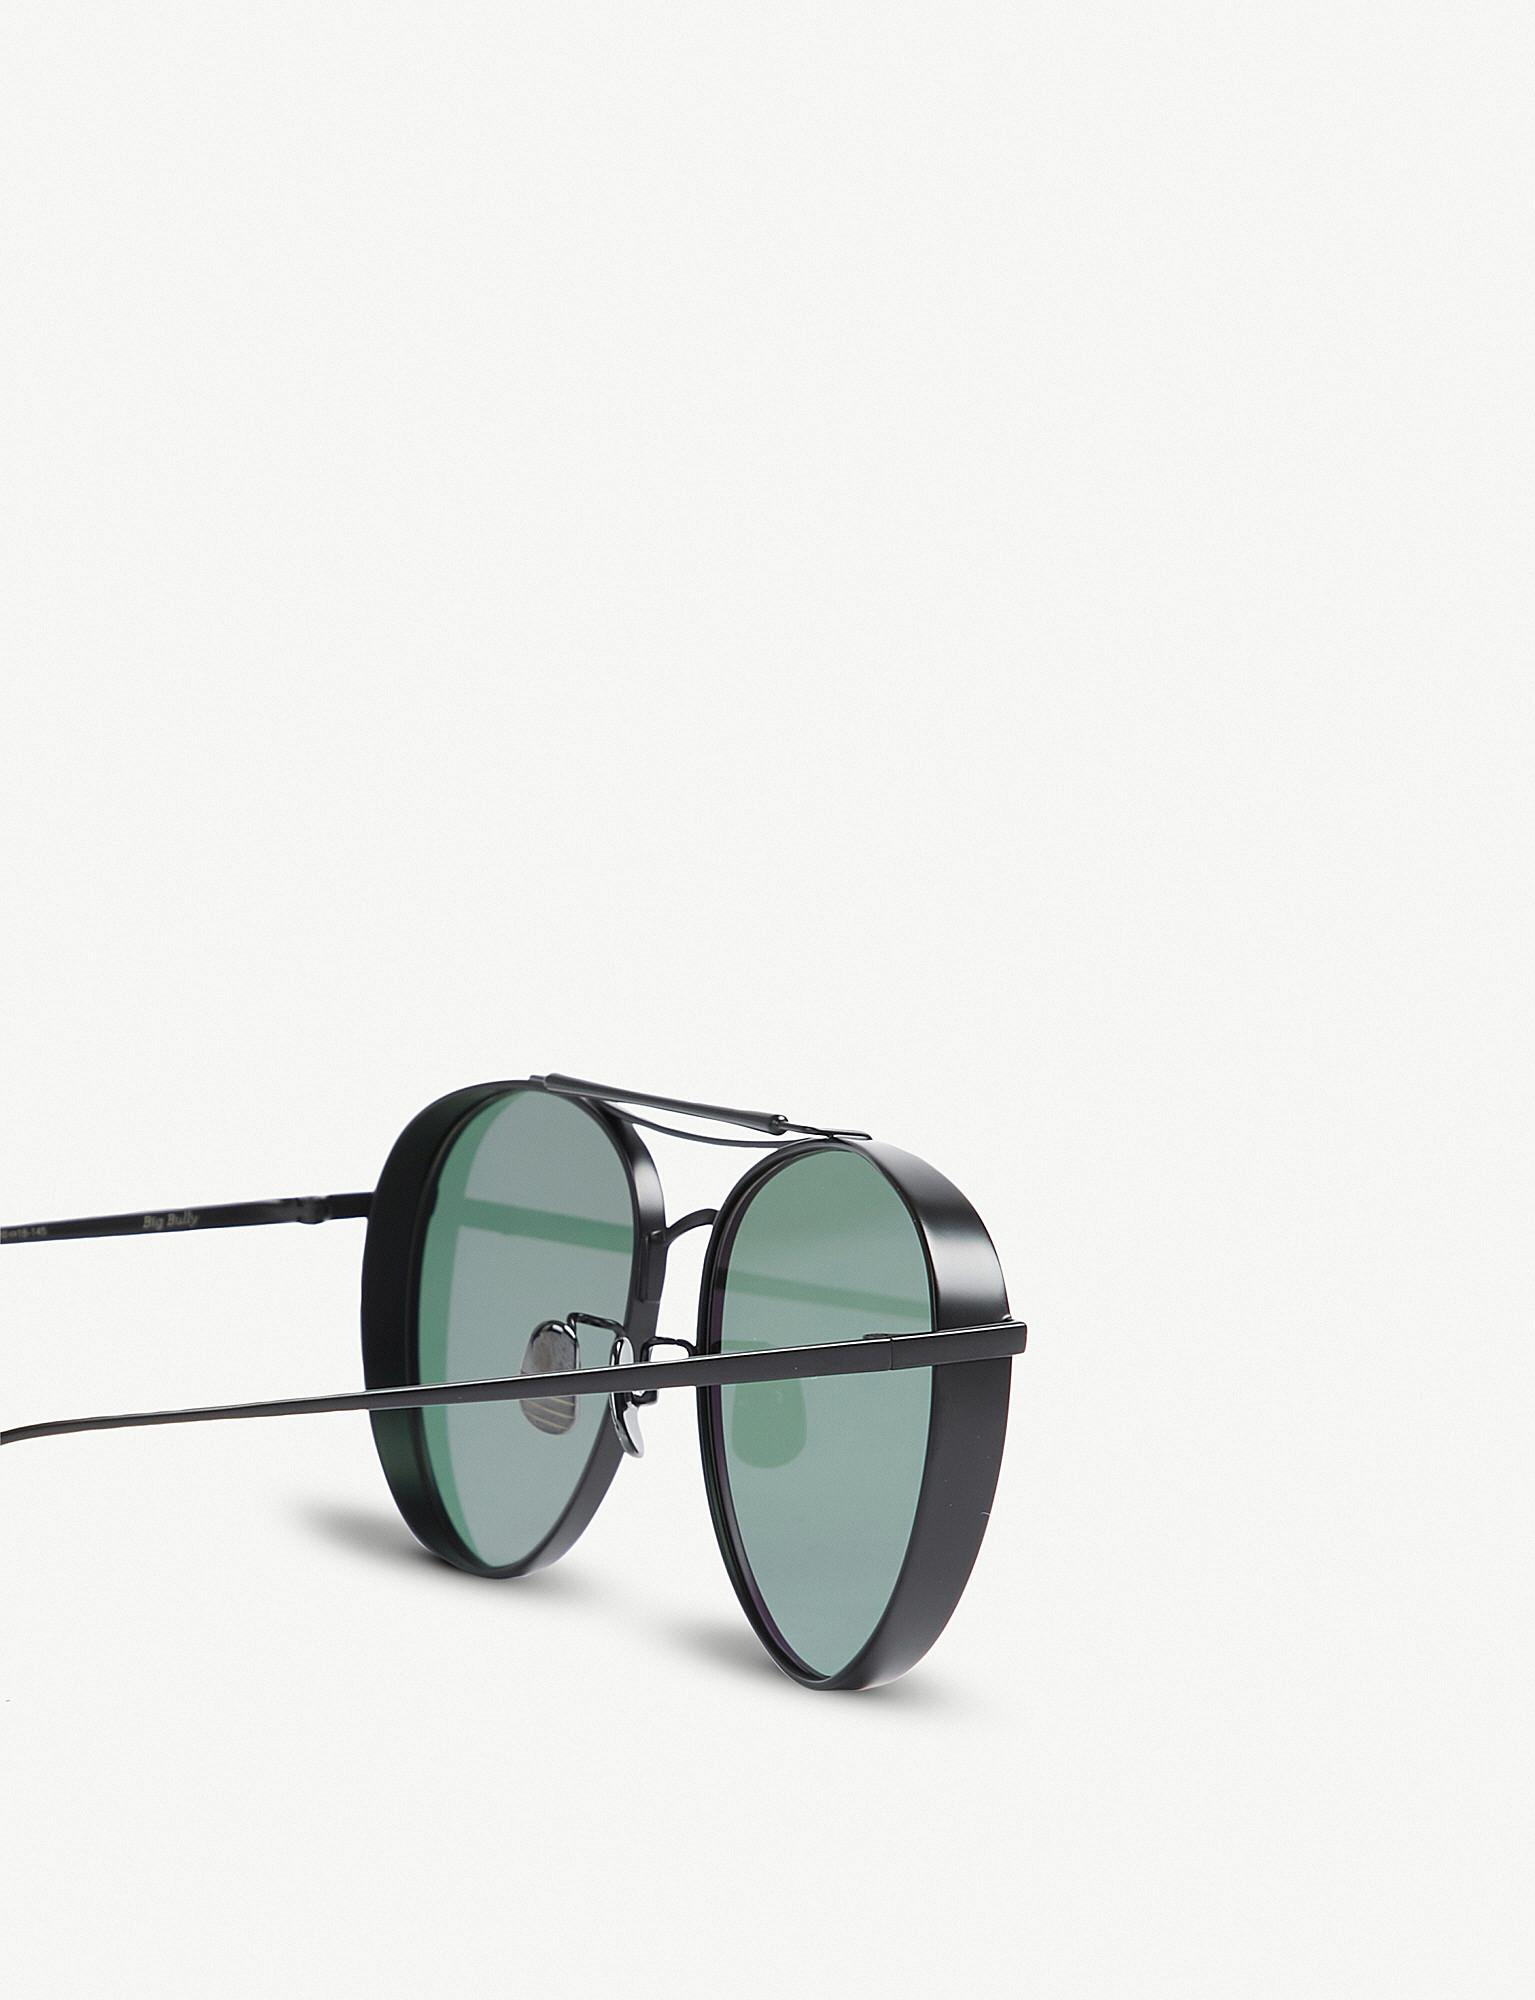 a0dde7d3b4a4 GENTLE MONSTER - Big Bully titanium sunglasses